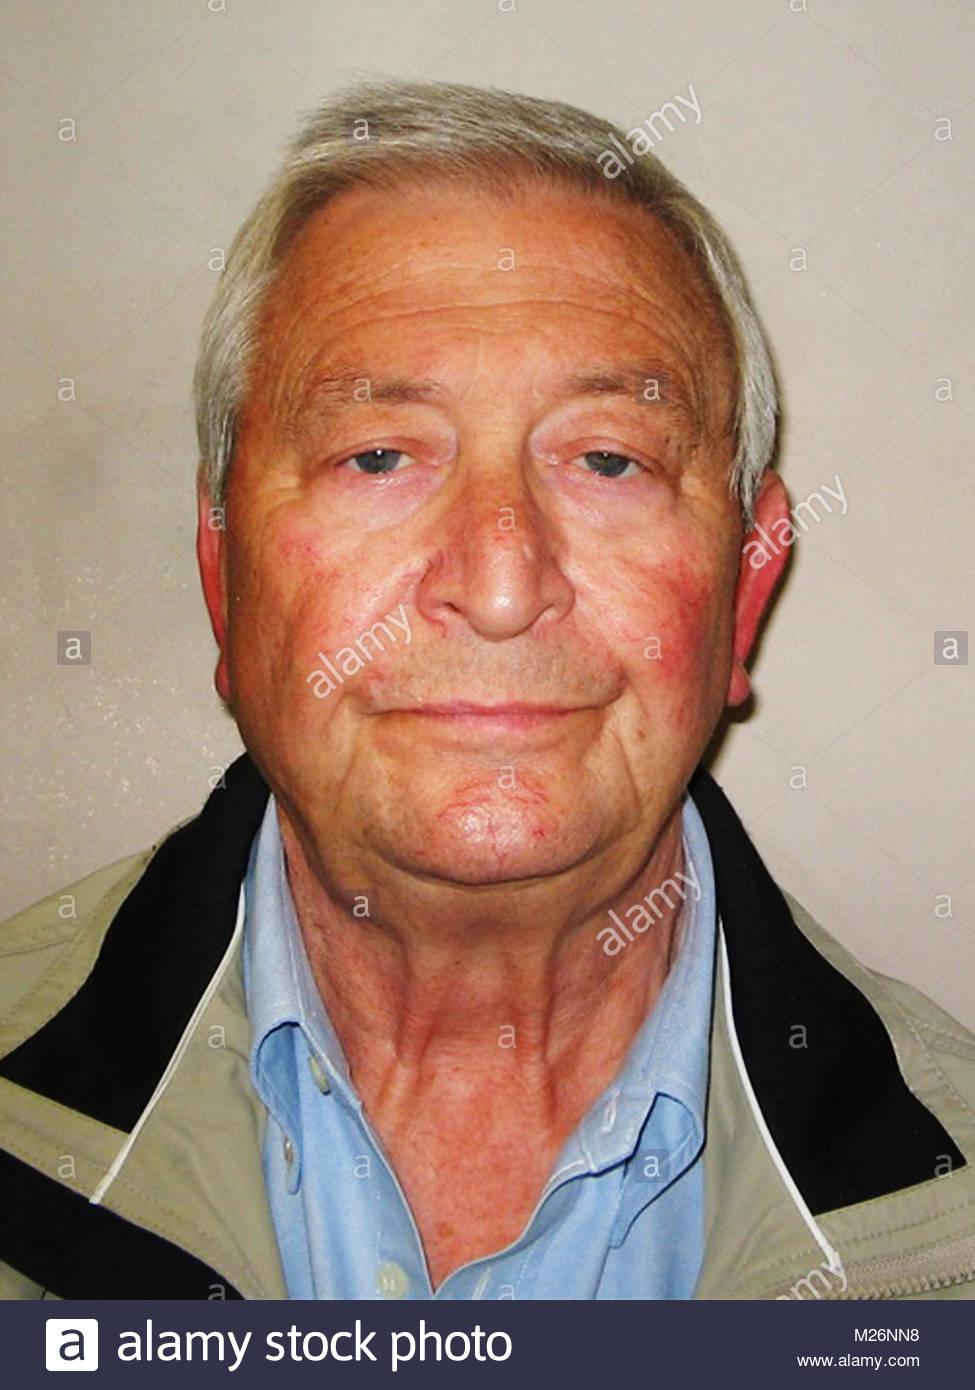 BEST QUALITY AVAILABLE Undated Metropolitan Police handout photo of Hatton Garden burglar Terry Perkins, 69, who - Stock Image